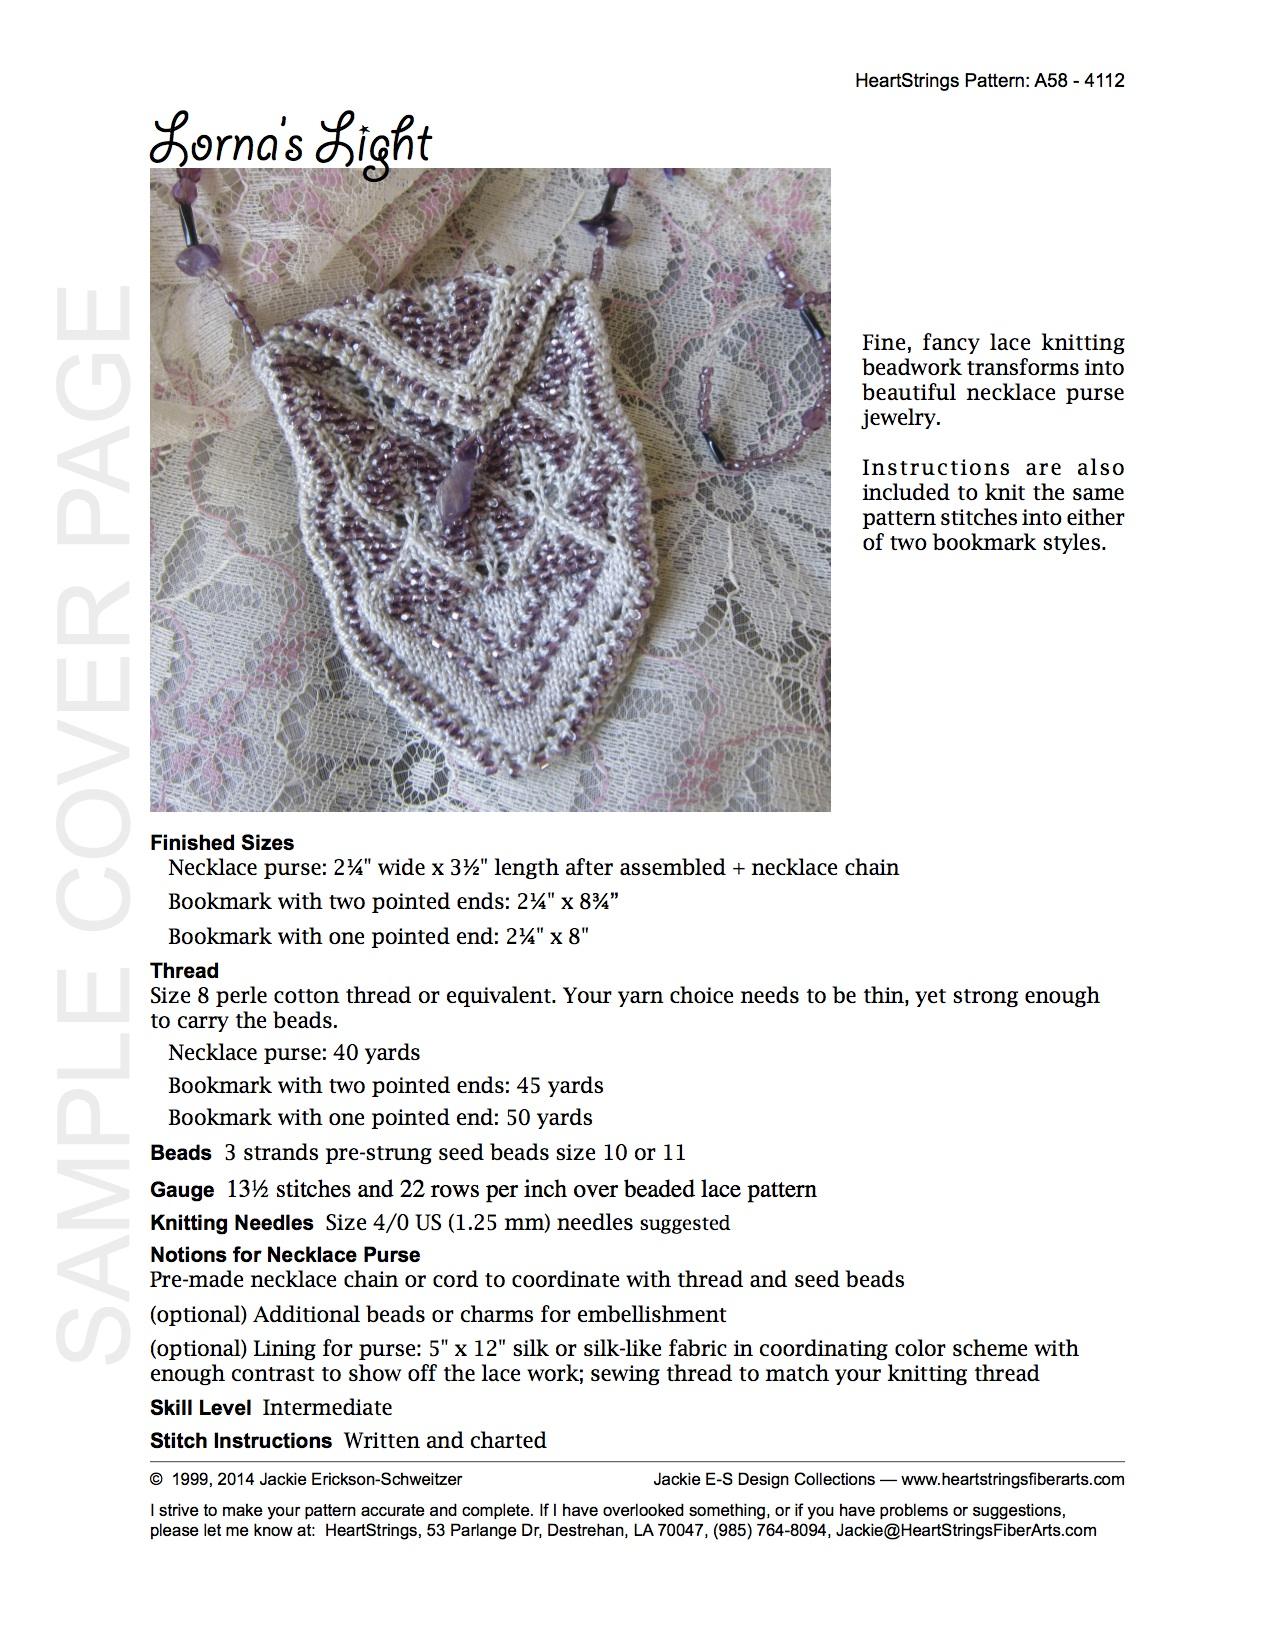 Bits of beads e patterns knit heartstrings learn and knit alongs precious treasures e pattern aka lornas light bankloansurffo Gallery